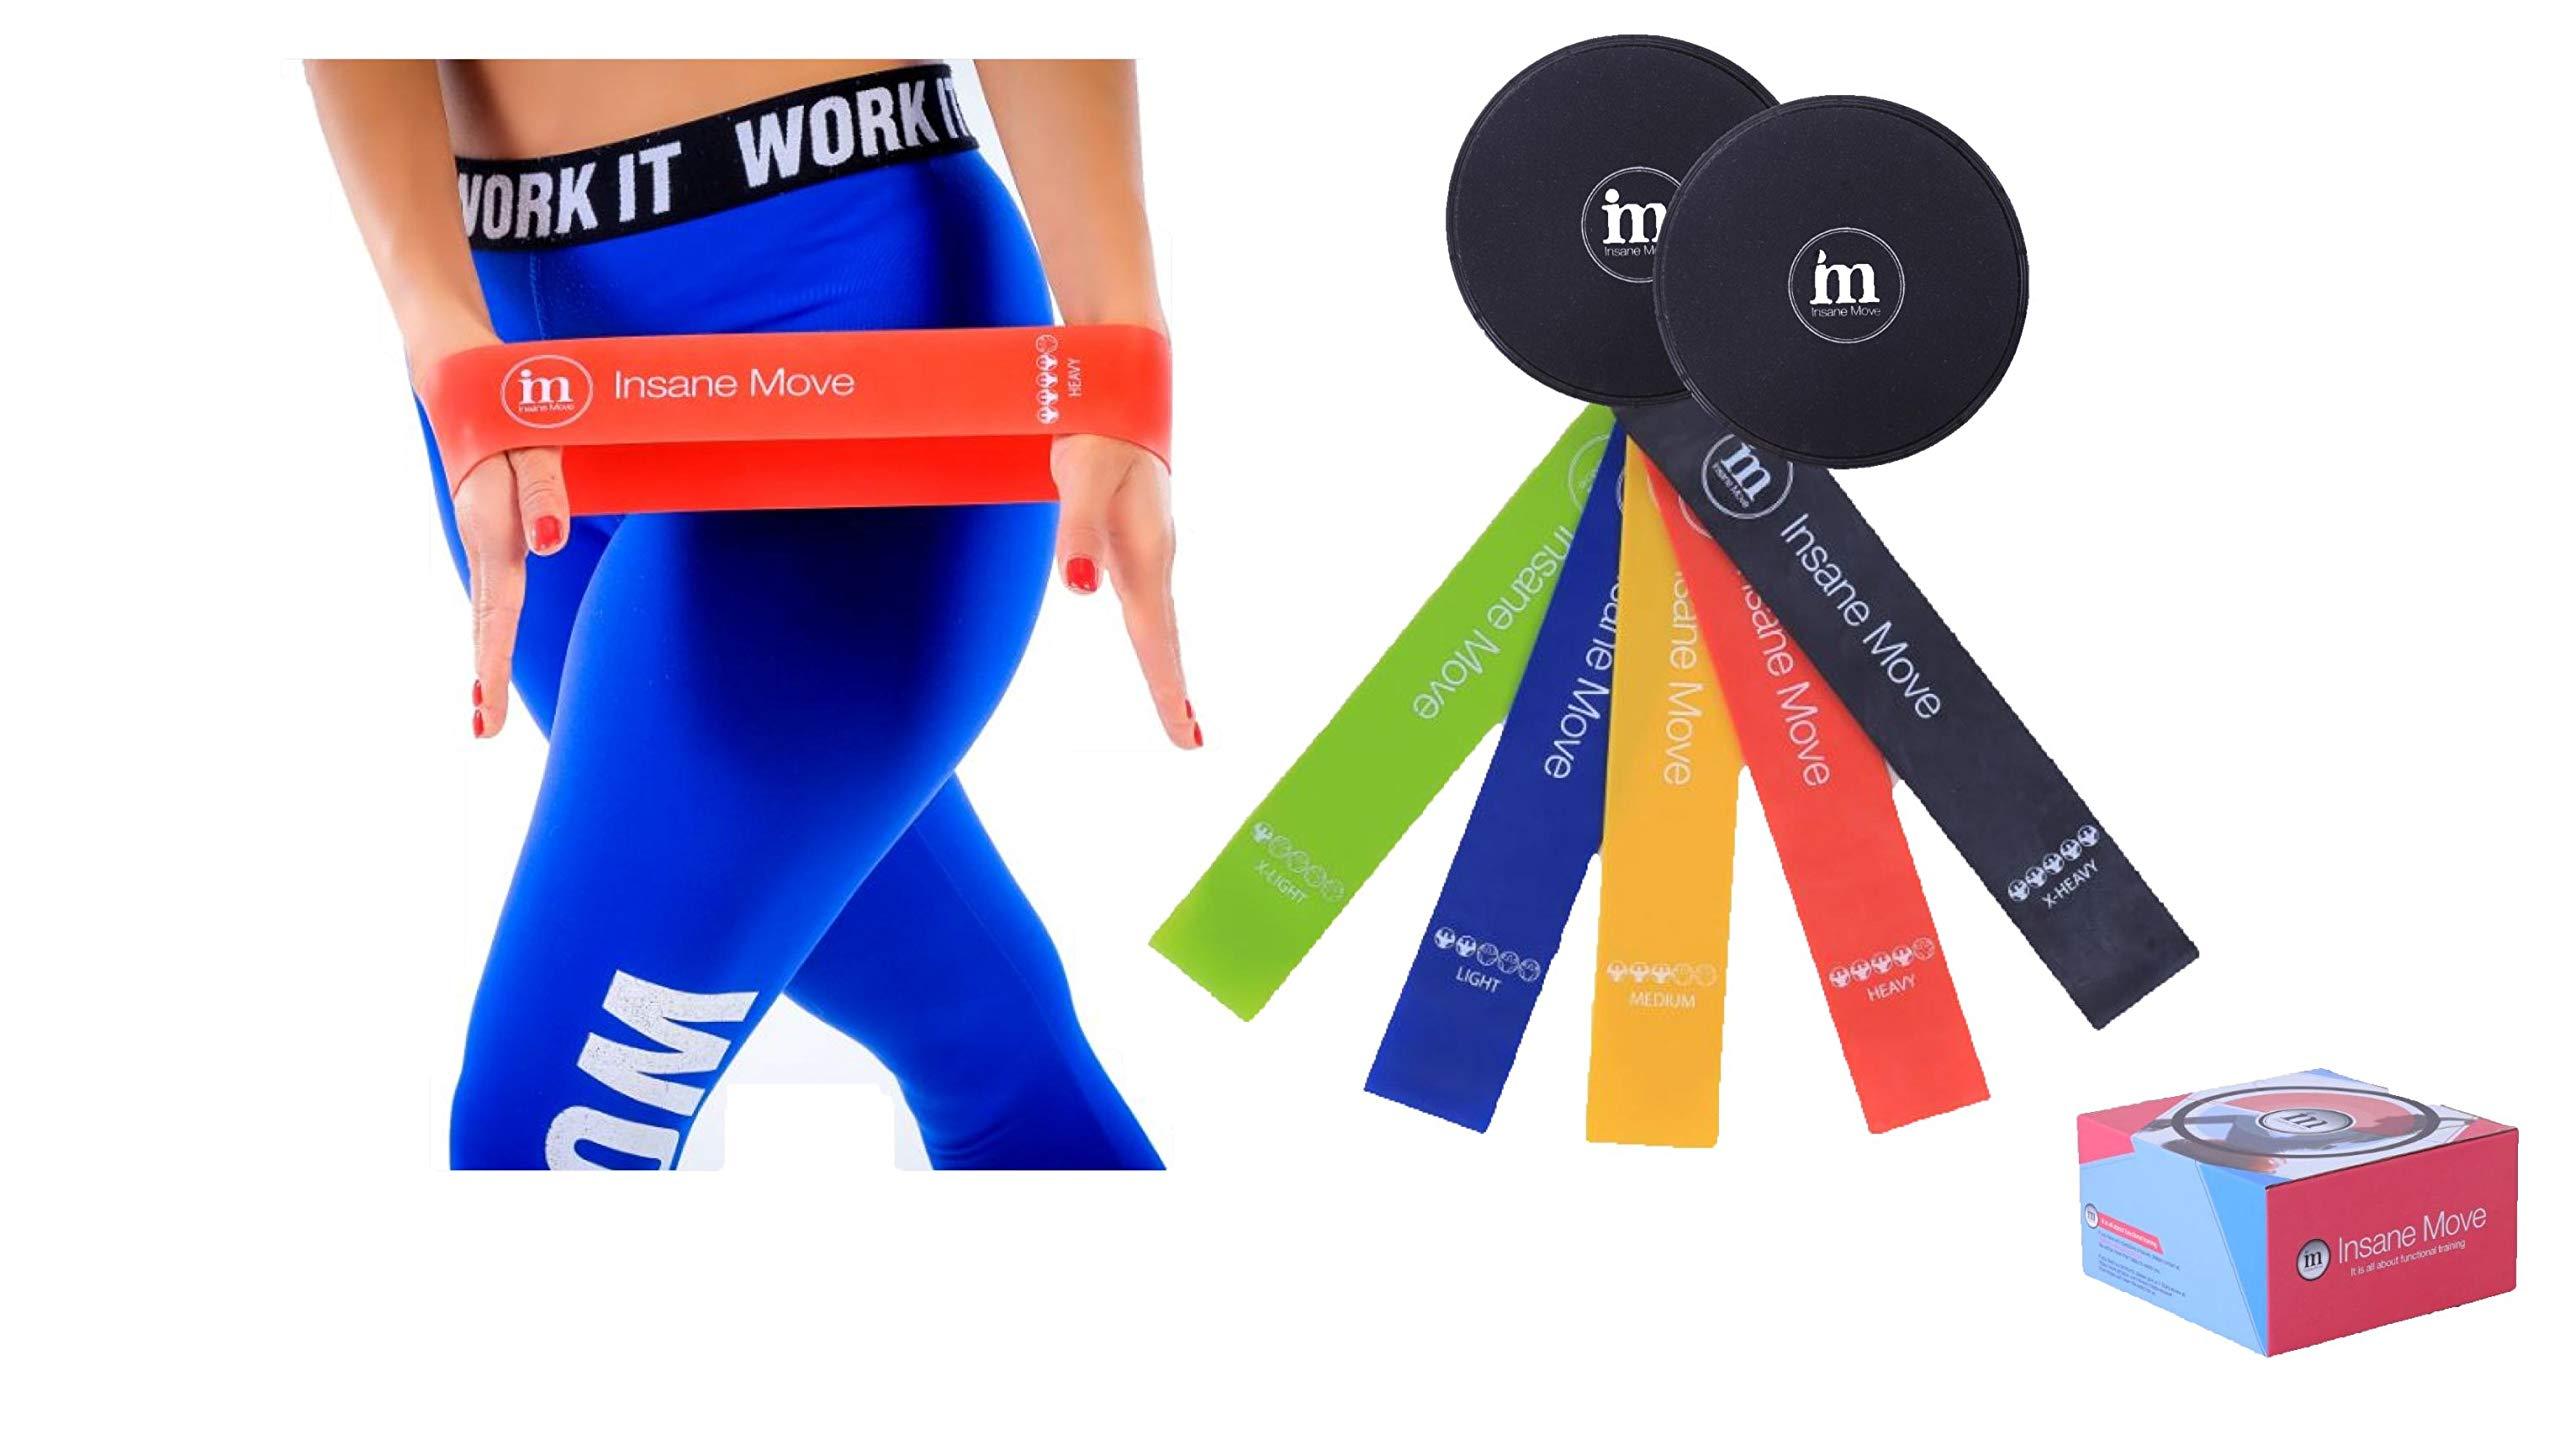 Insane Move Multi- Functional Fitness & Sports Training Set Different Resistance Level Workout Bands - 5 Resistance Bands, 2 Core Sliding Discs – Ideal Training Bands Men & Women